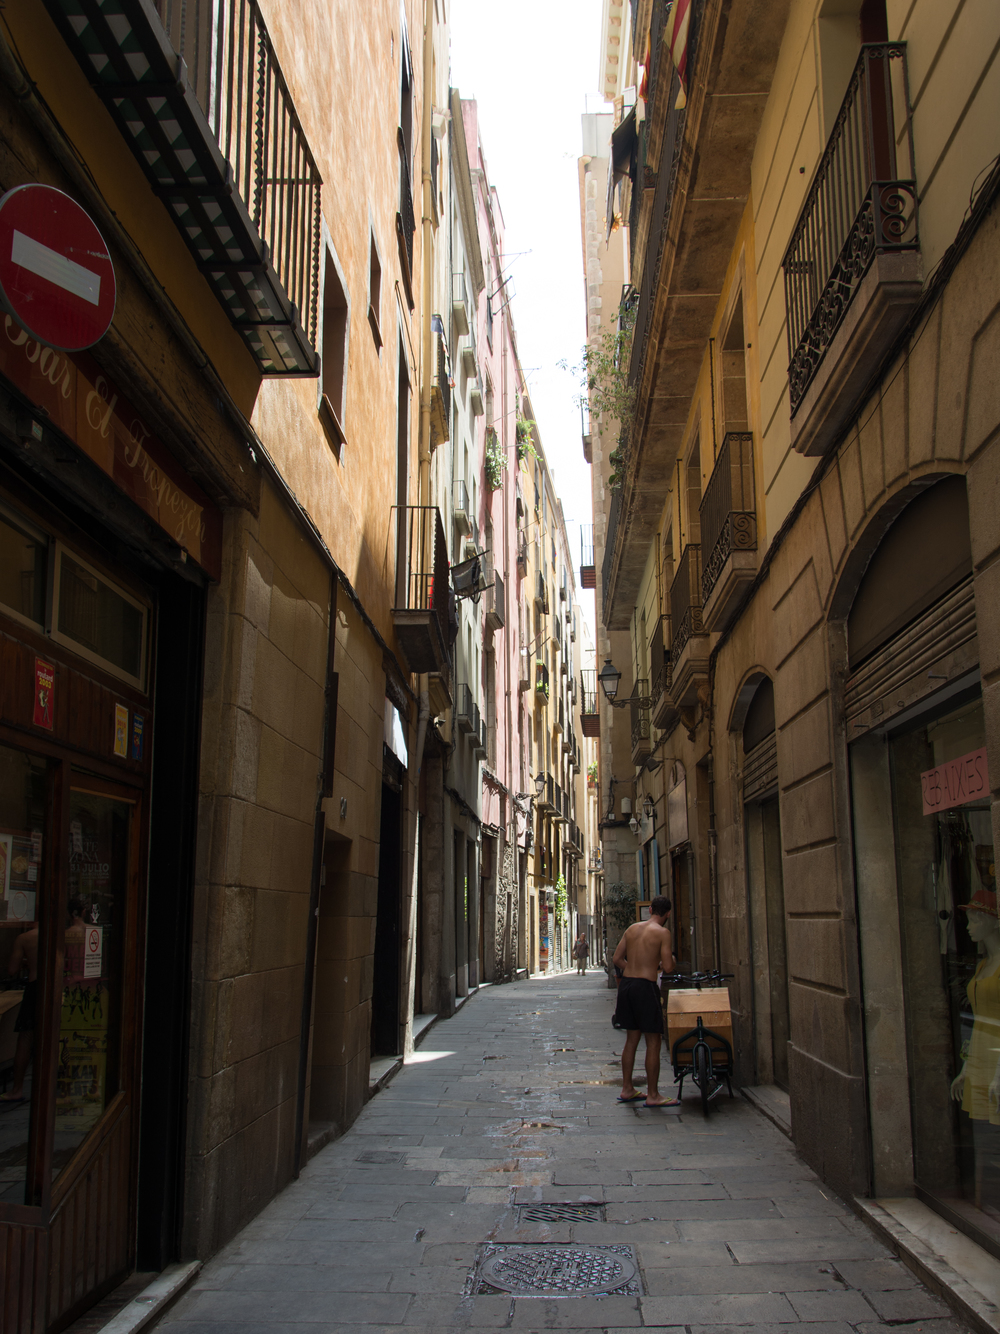 Barcelona_07.22.2016_370.jpg